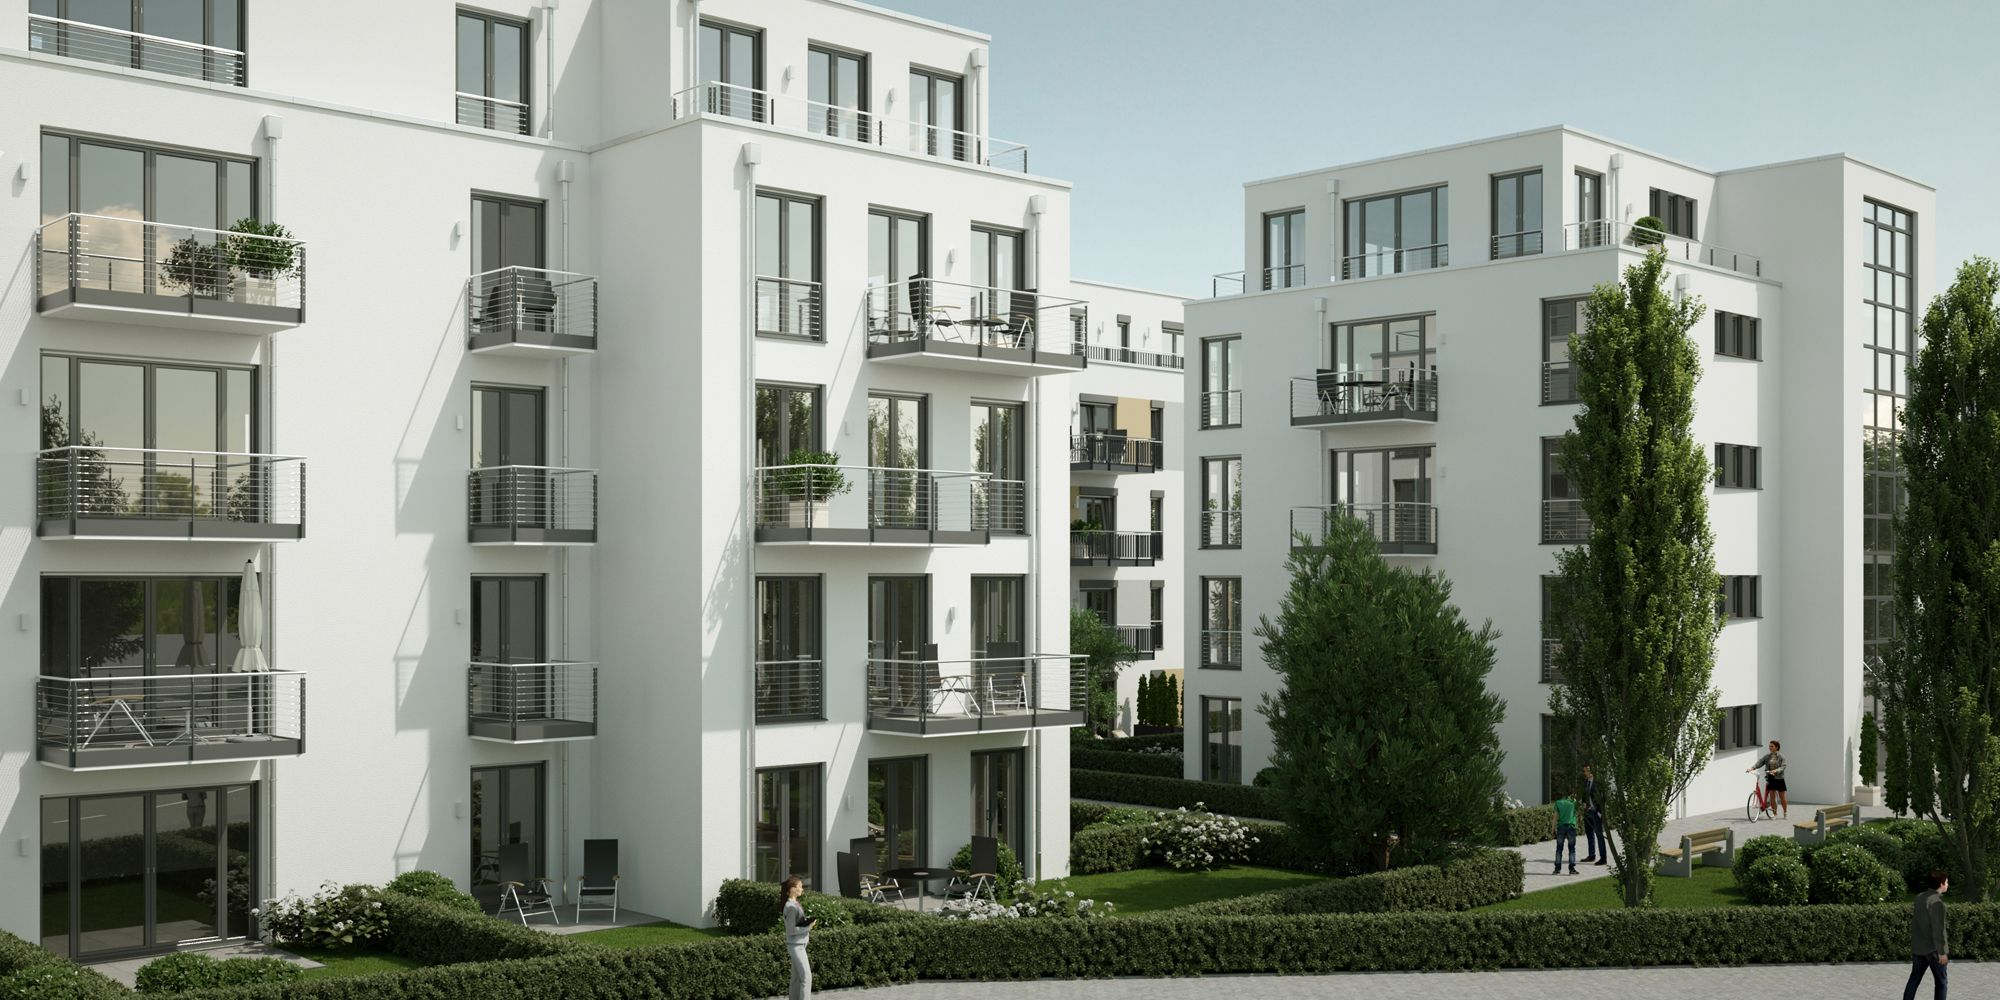 3D Visualisierung Wohnbauprojekt Berlin Köpenick